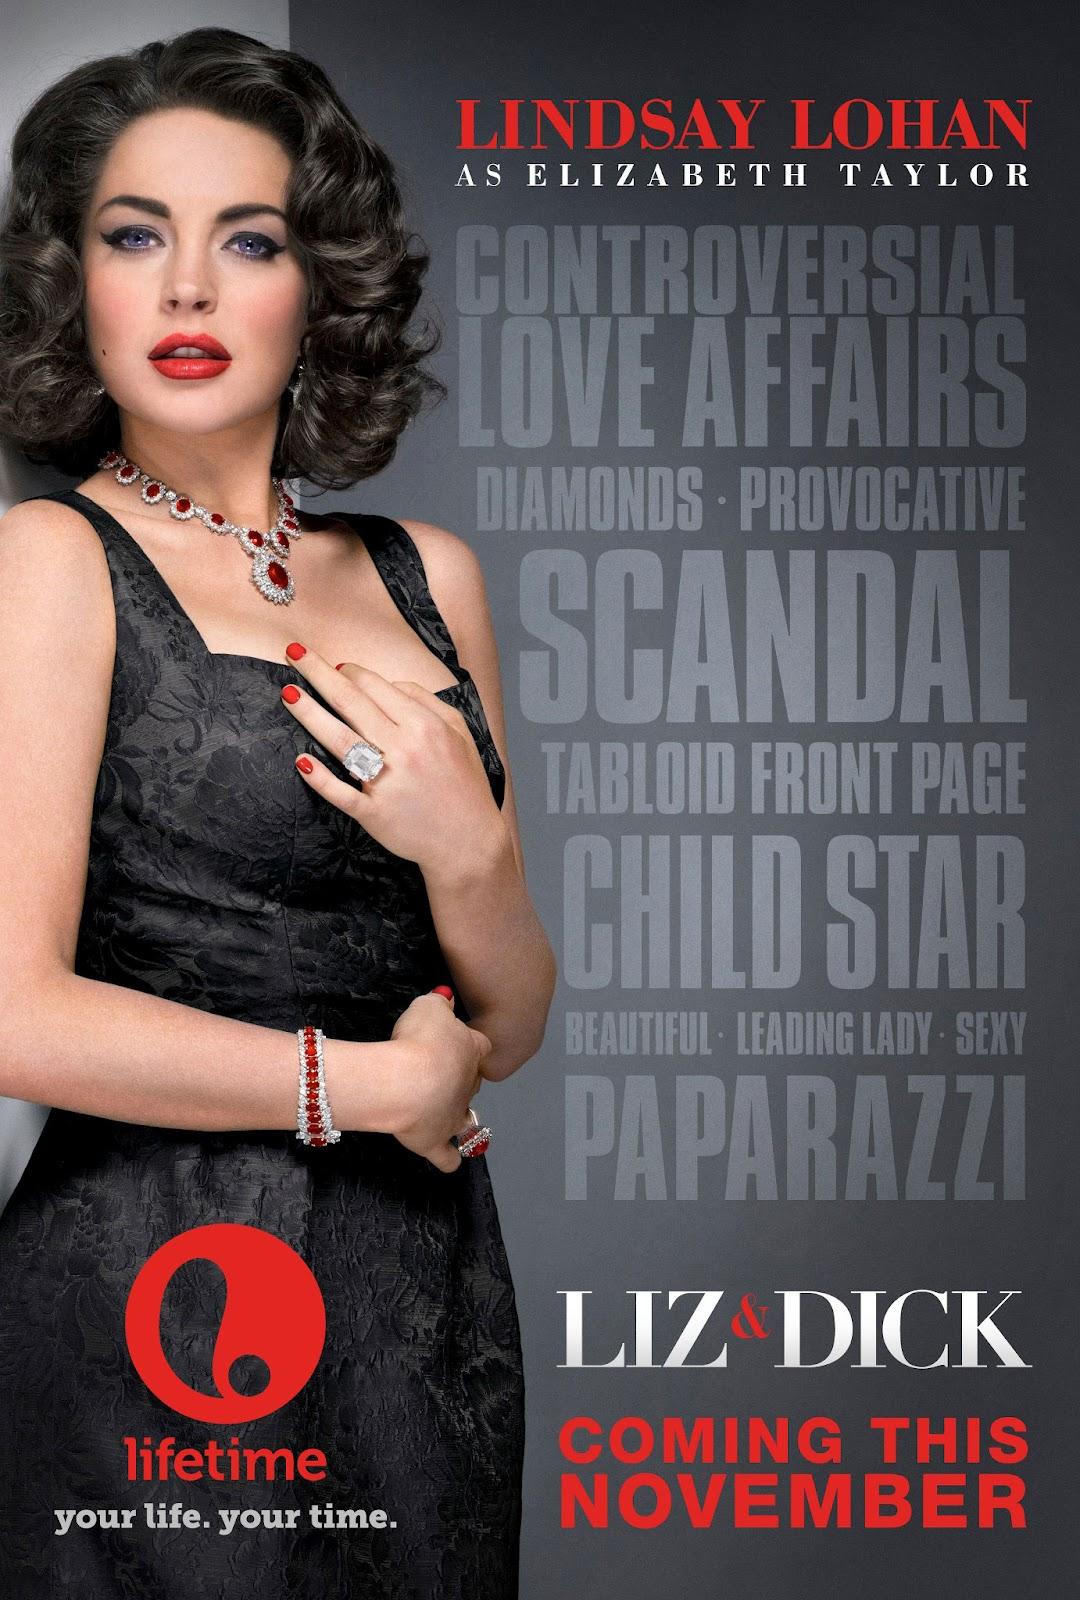 http://2.bp.blogspot.com/-rIT5__zbJrE/UF8vGijoZDI/AAAAAAAAH1g/mLDgFyzkT0w/s1600/liz+y+dick+poster.jpg